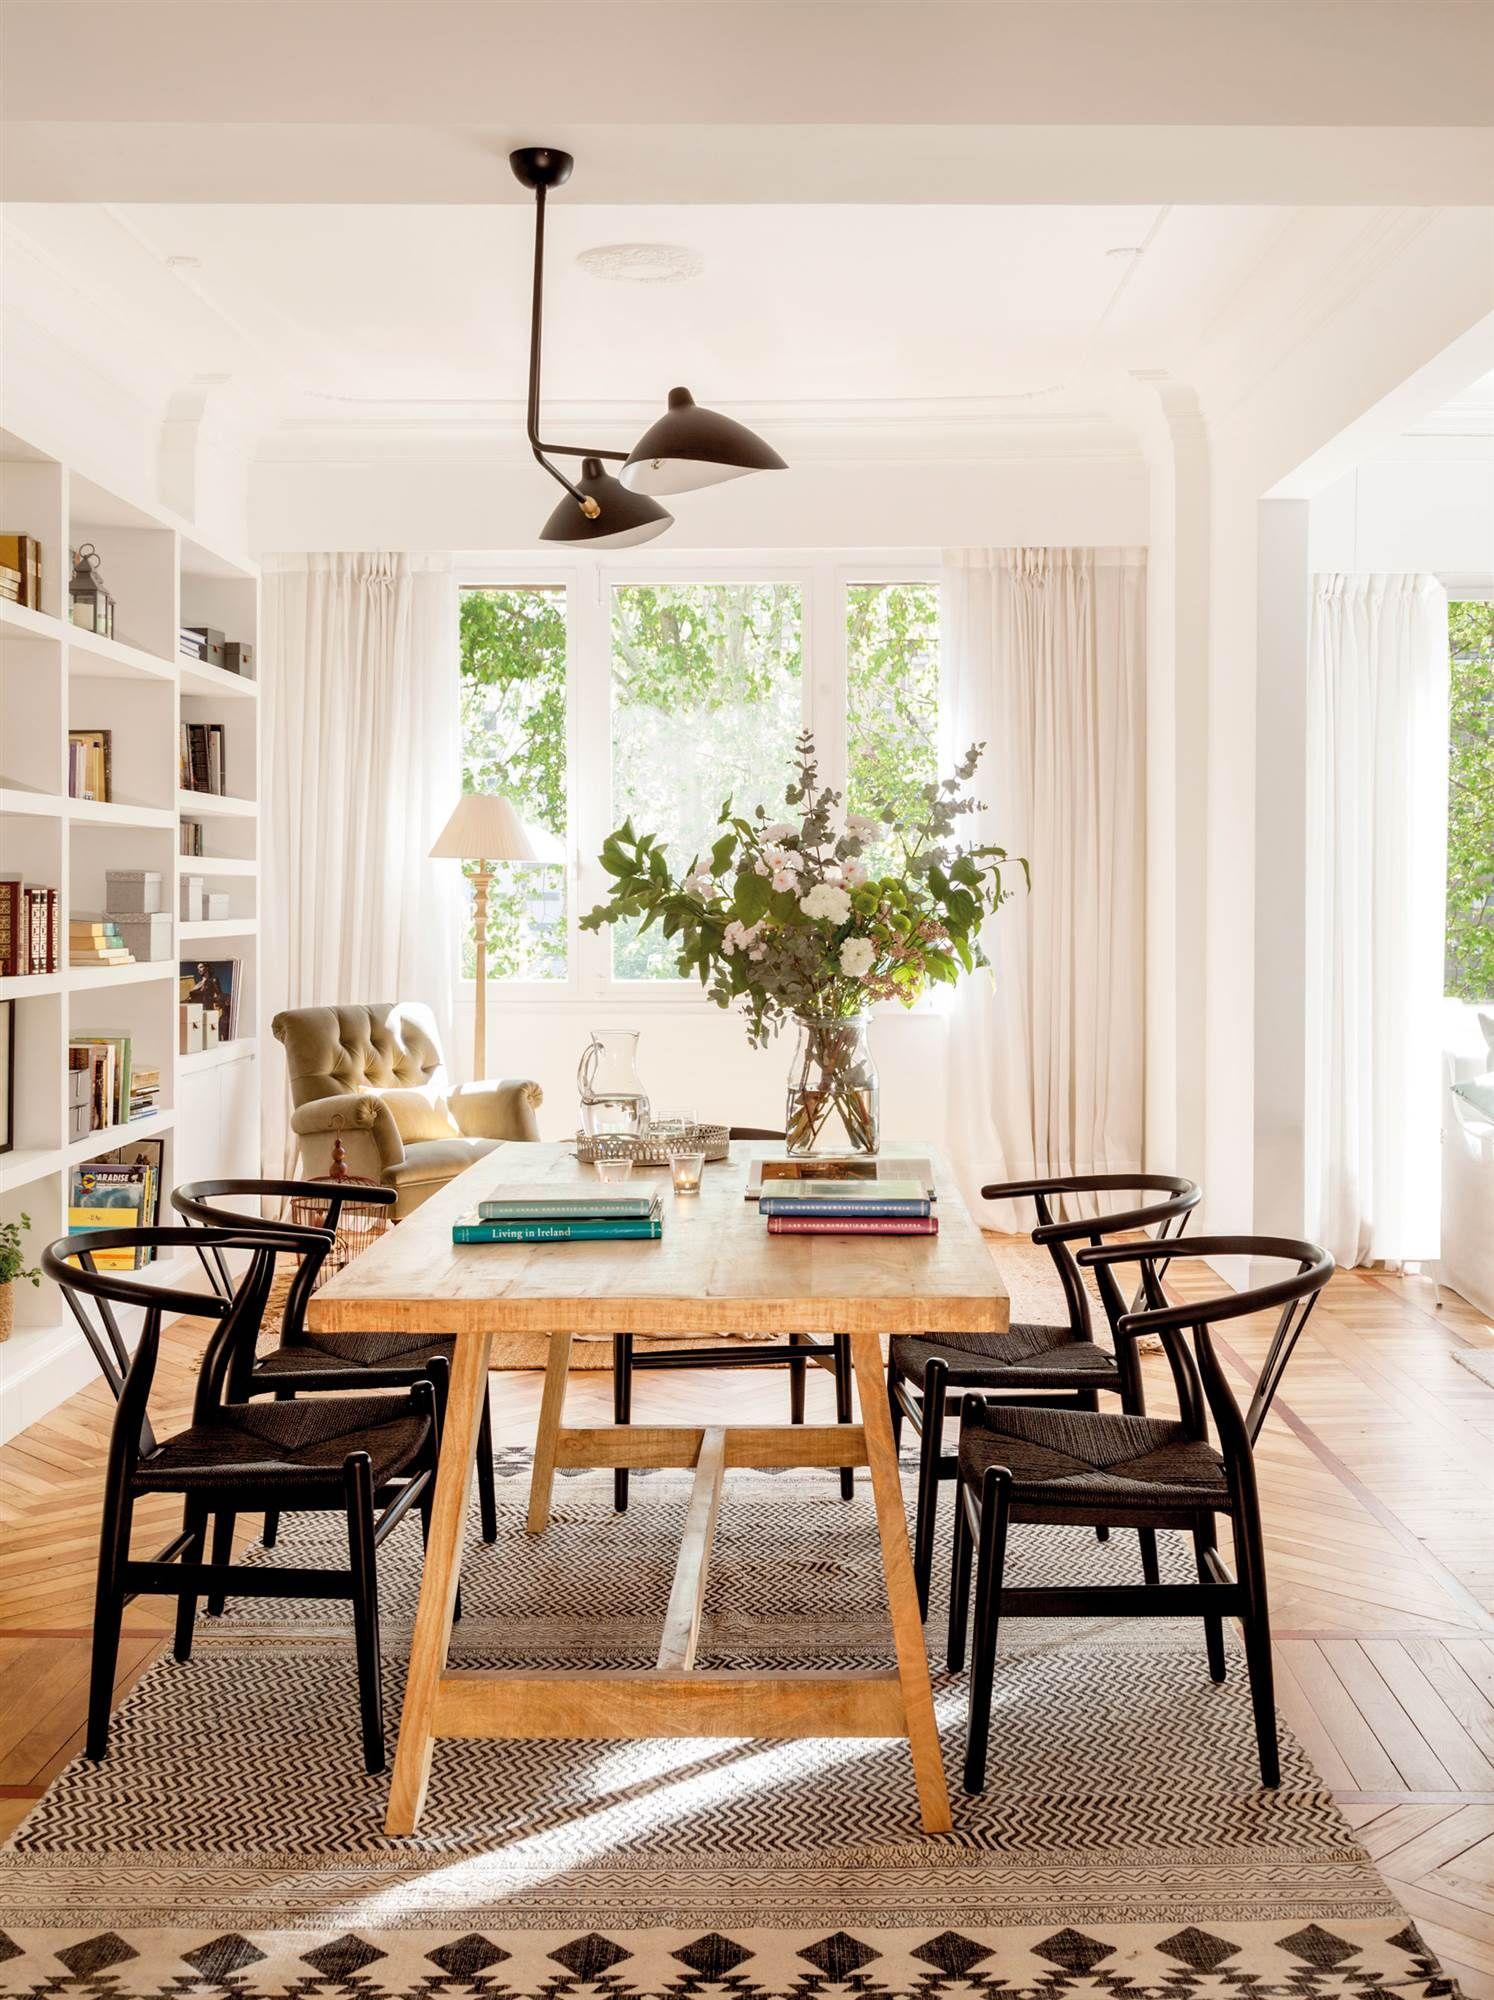 Comedor con sillas ch24 en negro 00458369 comedores for Decoracion madera natural